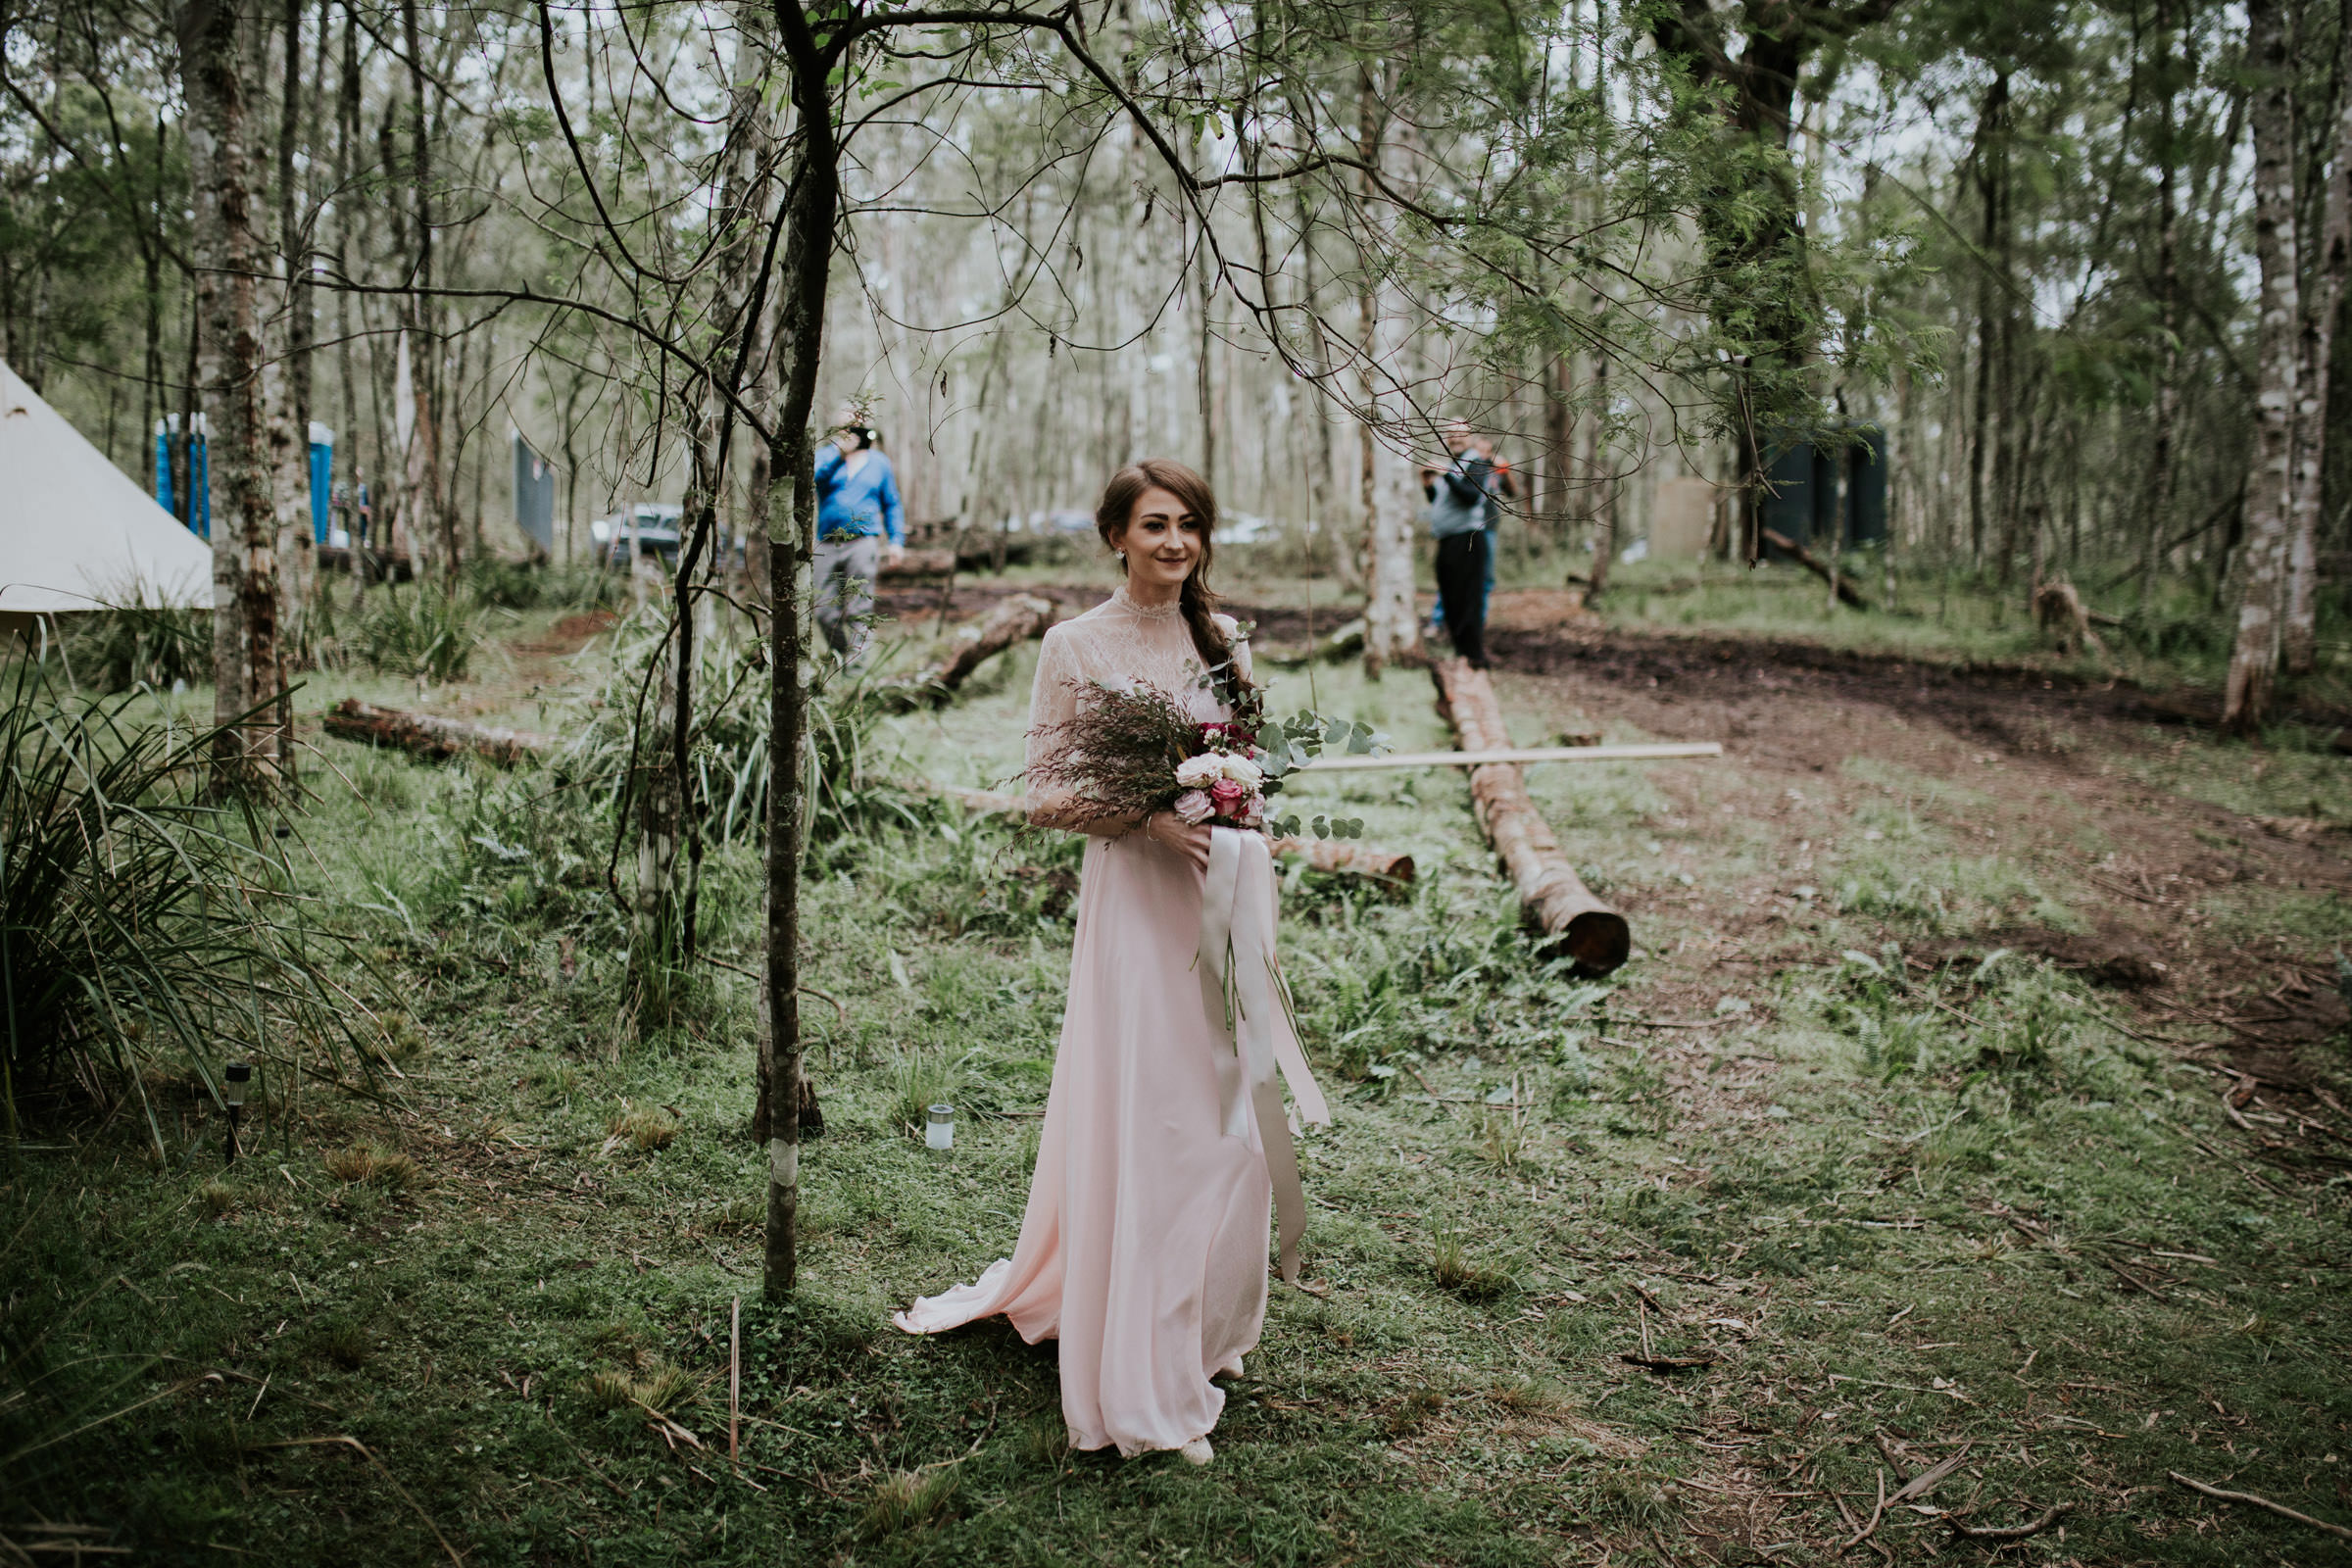 Emma+John+Far+South+Coast+Wedding+Festivl+Glamping+Bush-90.jpg